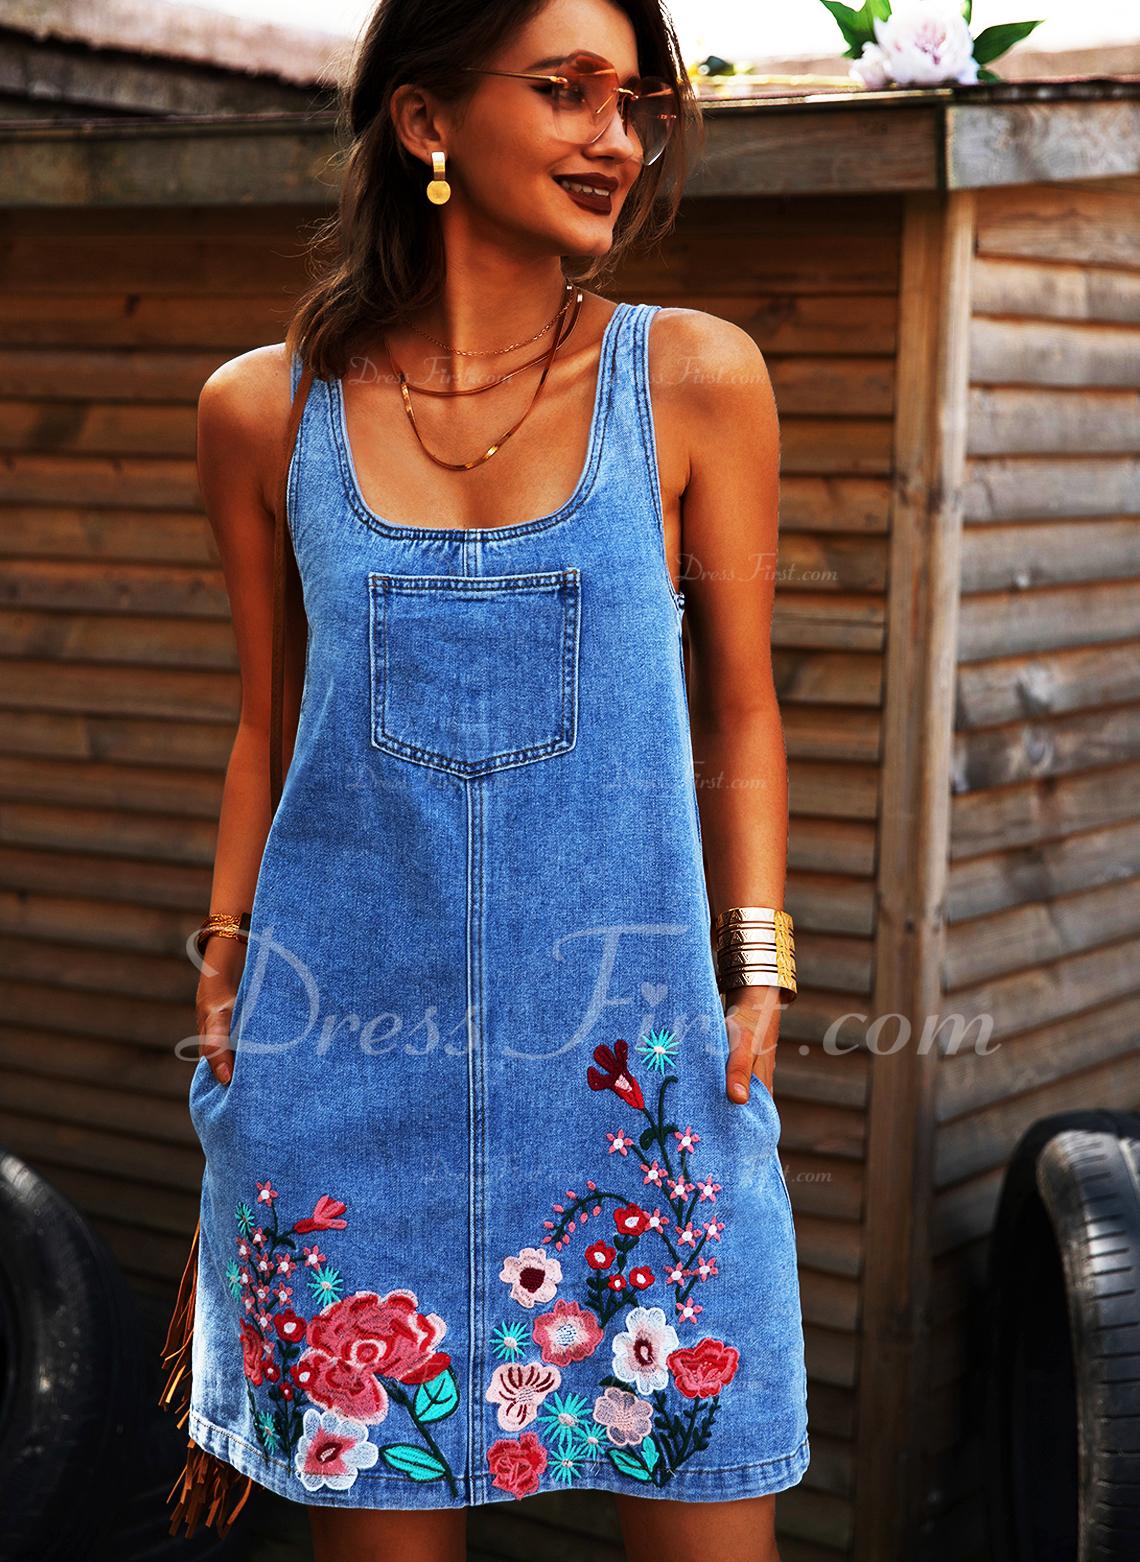 Blomster Print Skiftekjoler Ærmeløs Mini Jean Casual Tank Mode kjoler